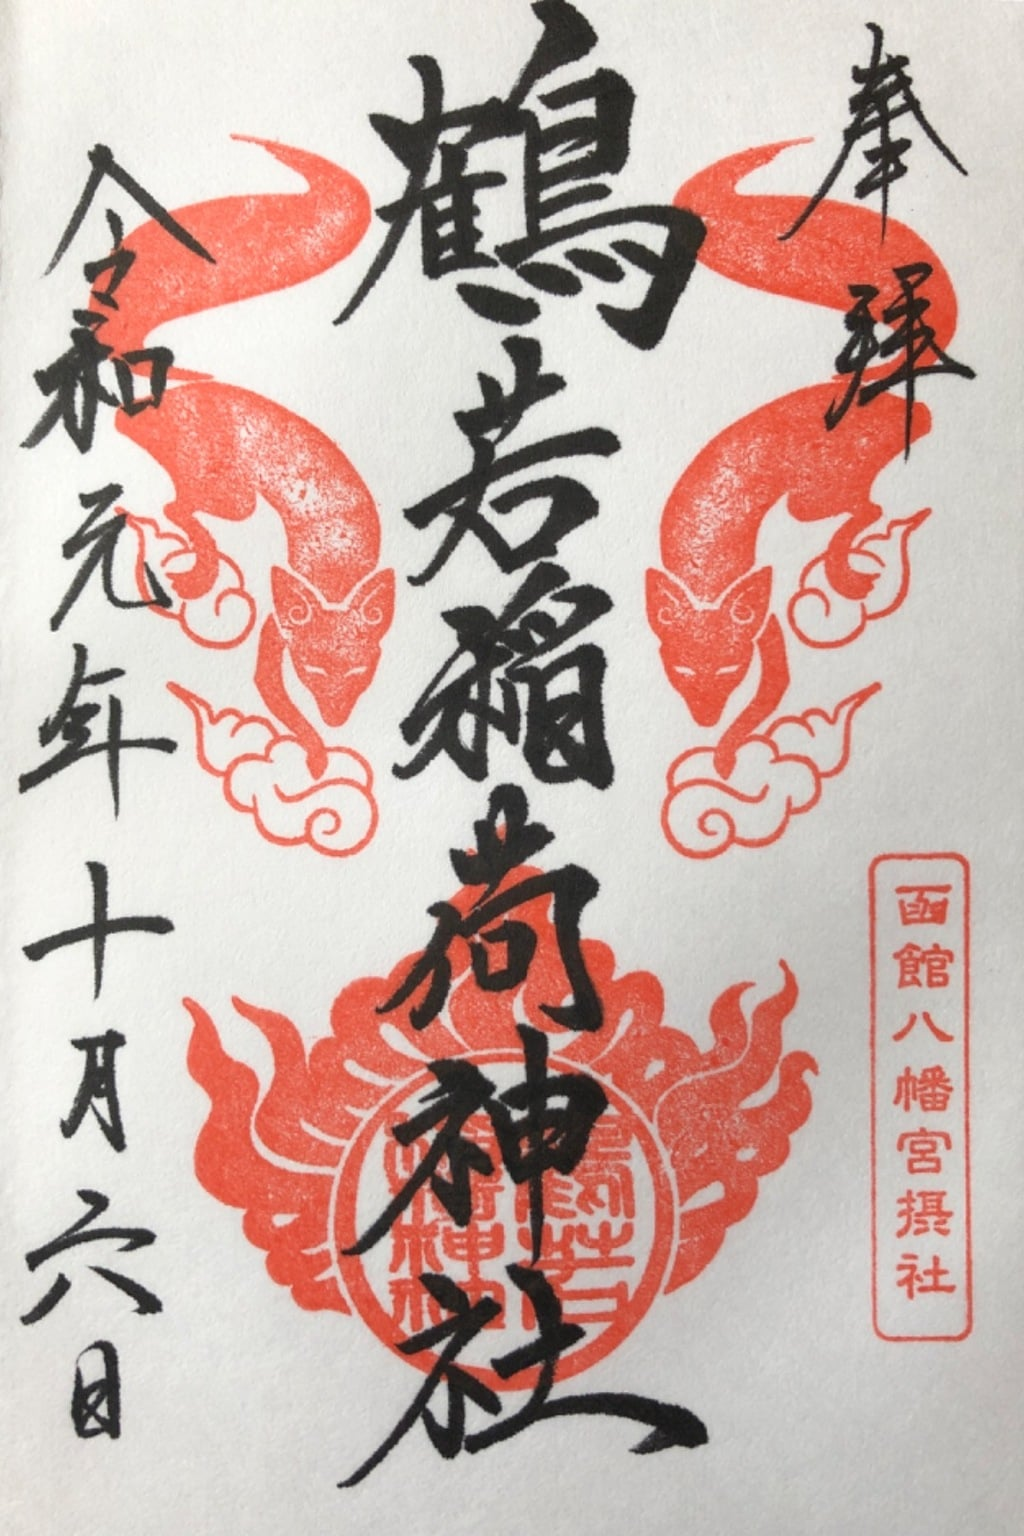 鶴若稲荷神社の御朱印